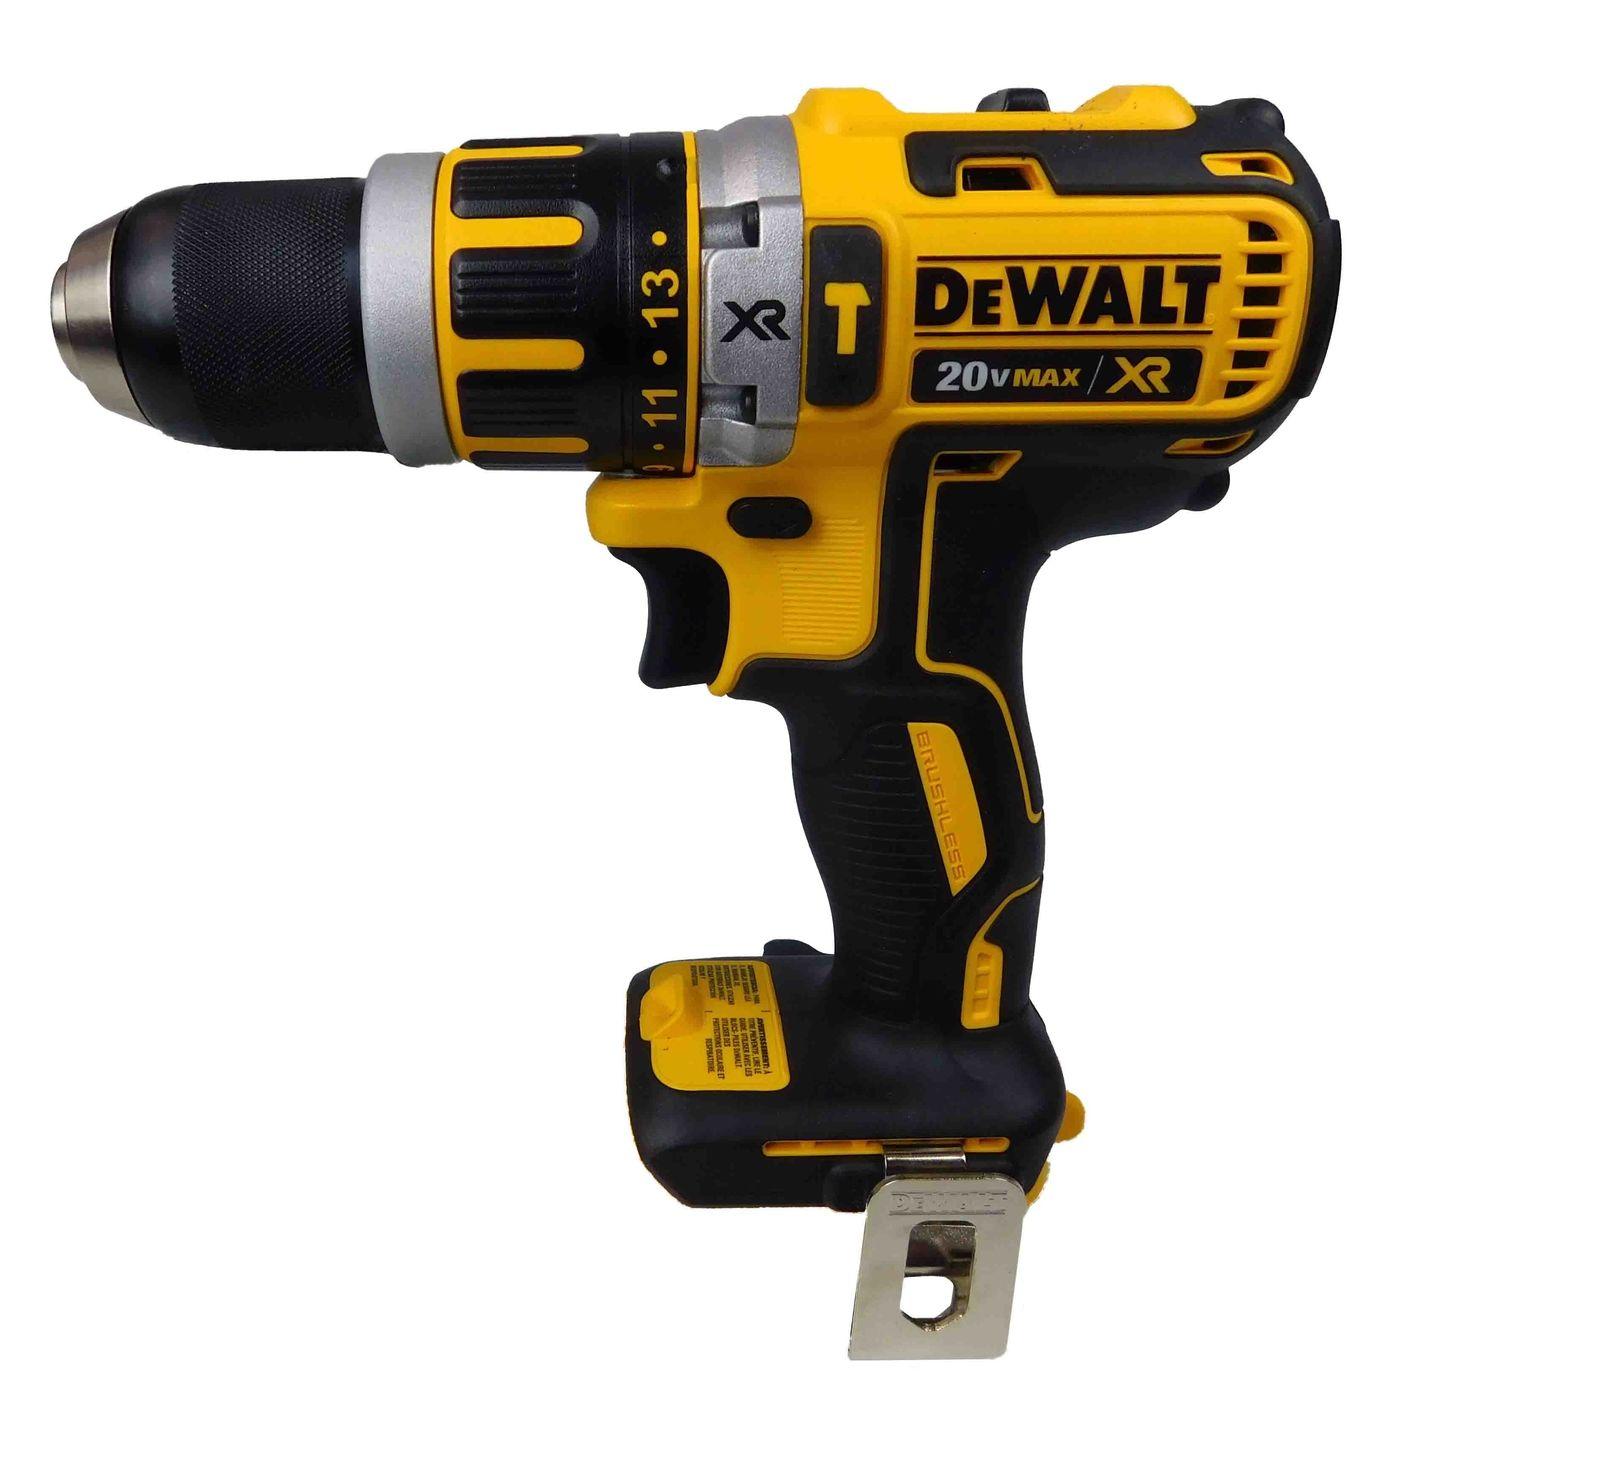 Dewalt-20V-DCD796B-Hammer-Drill-DCB204-4-Ah-Battery-DCB115-Battery-Charger-Bag-image-2